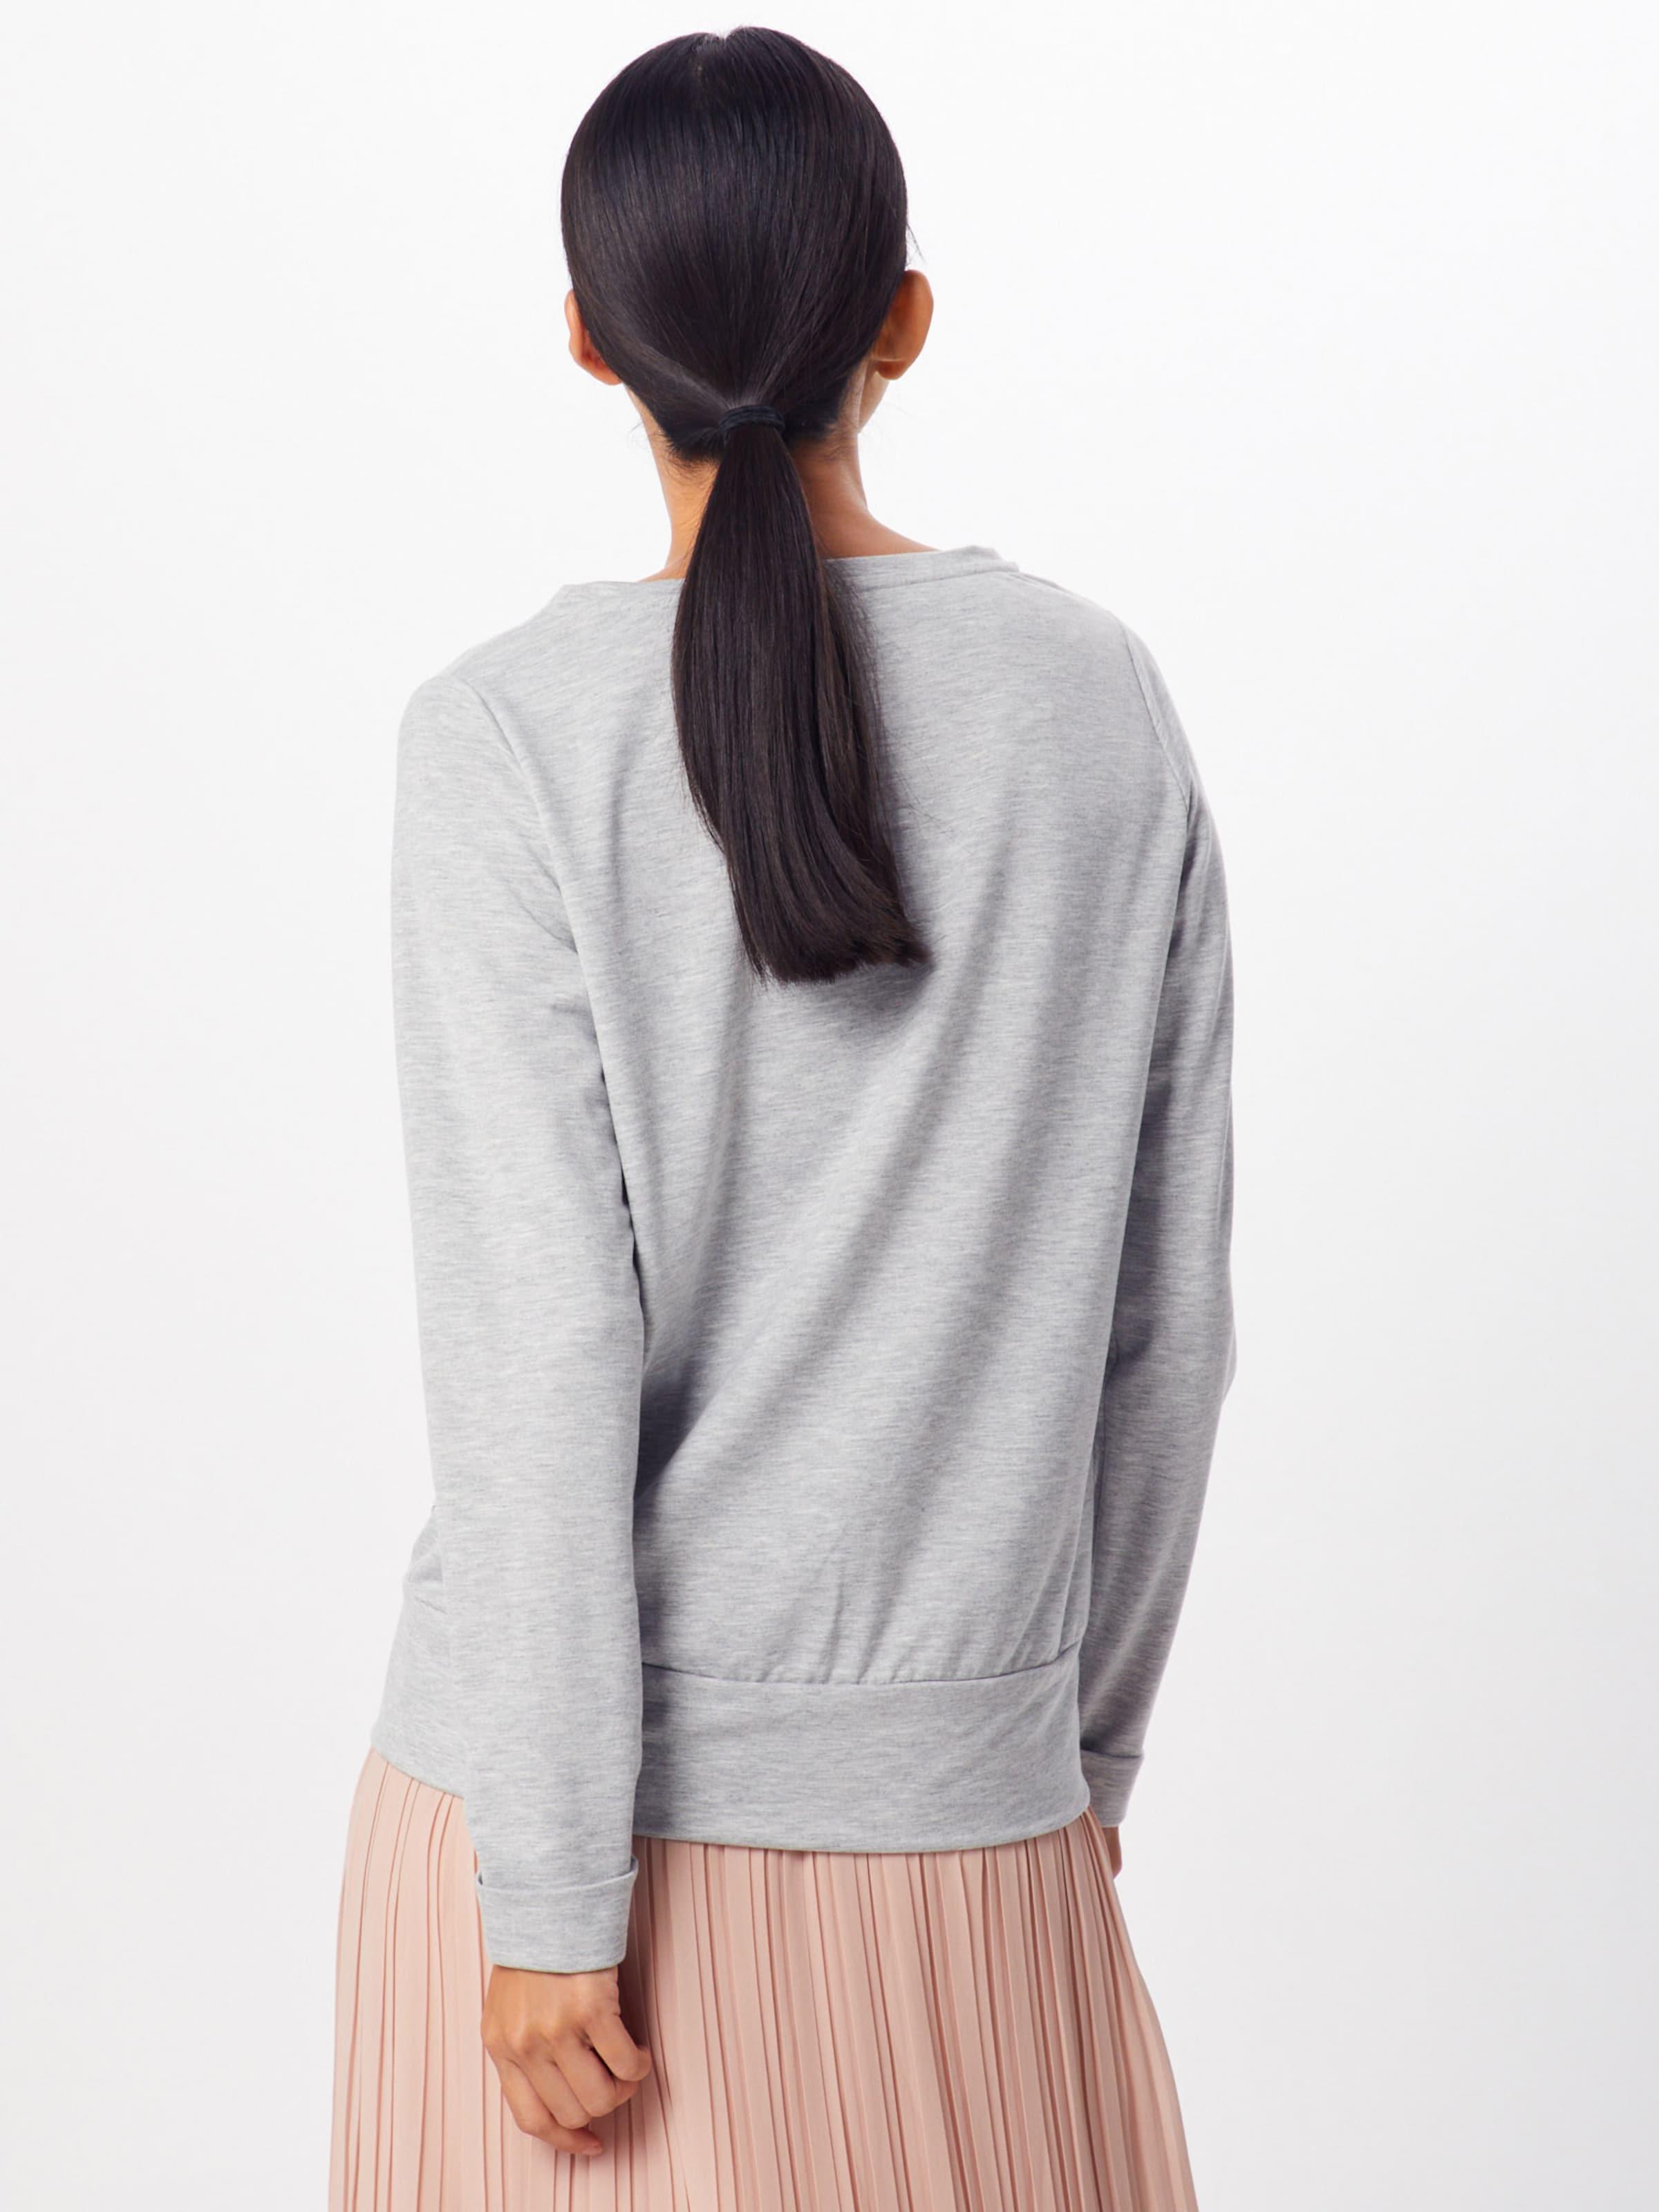 Lw' Hellgrau Sweatshirt In Cas Esprit 'dortje bvIYf7g6y